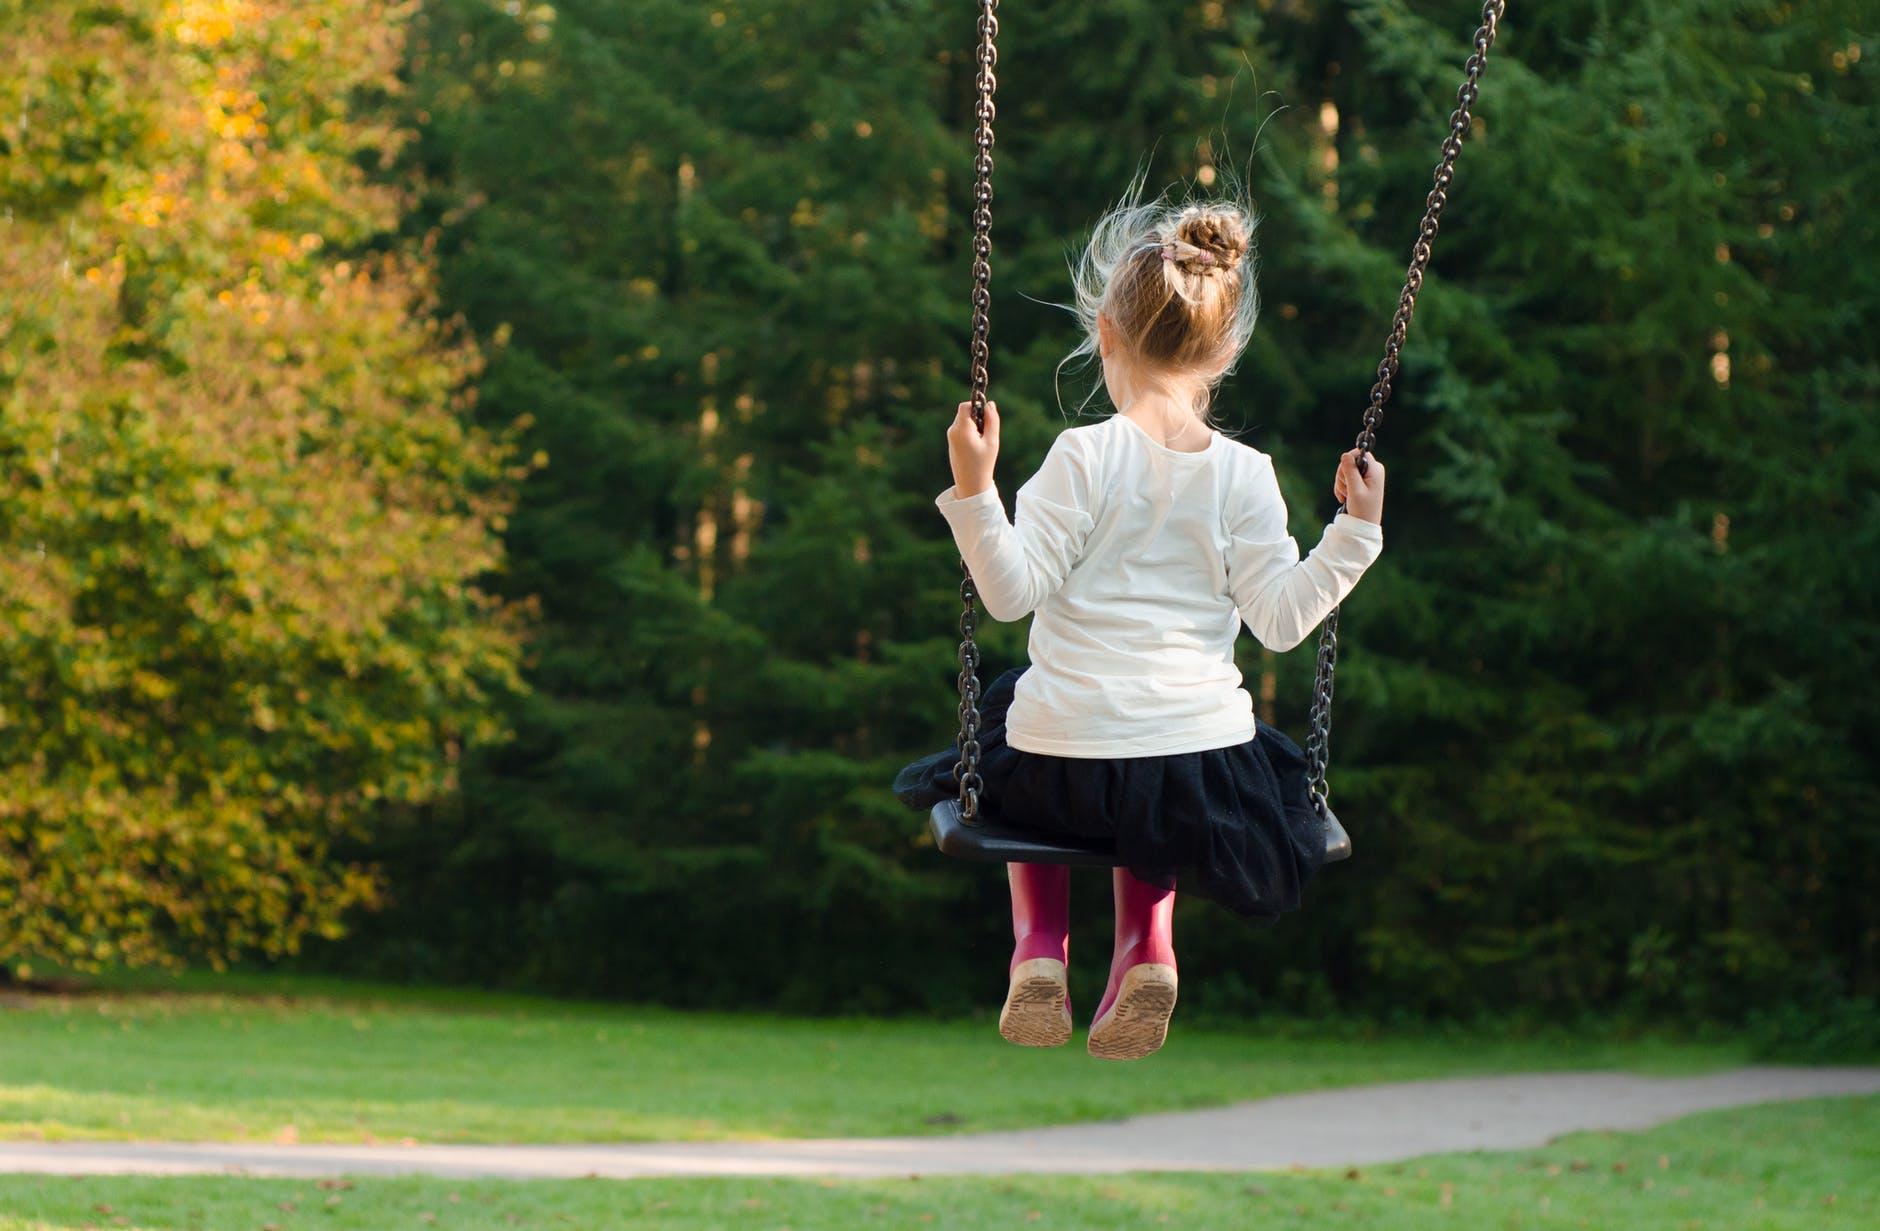 thelashop, trampoline accessories, girl swinging